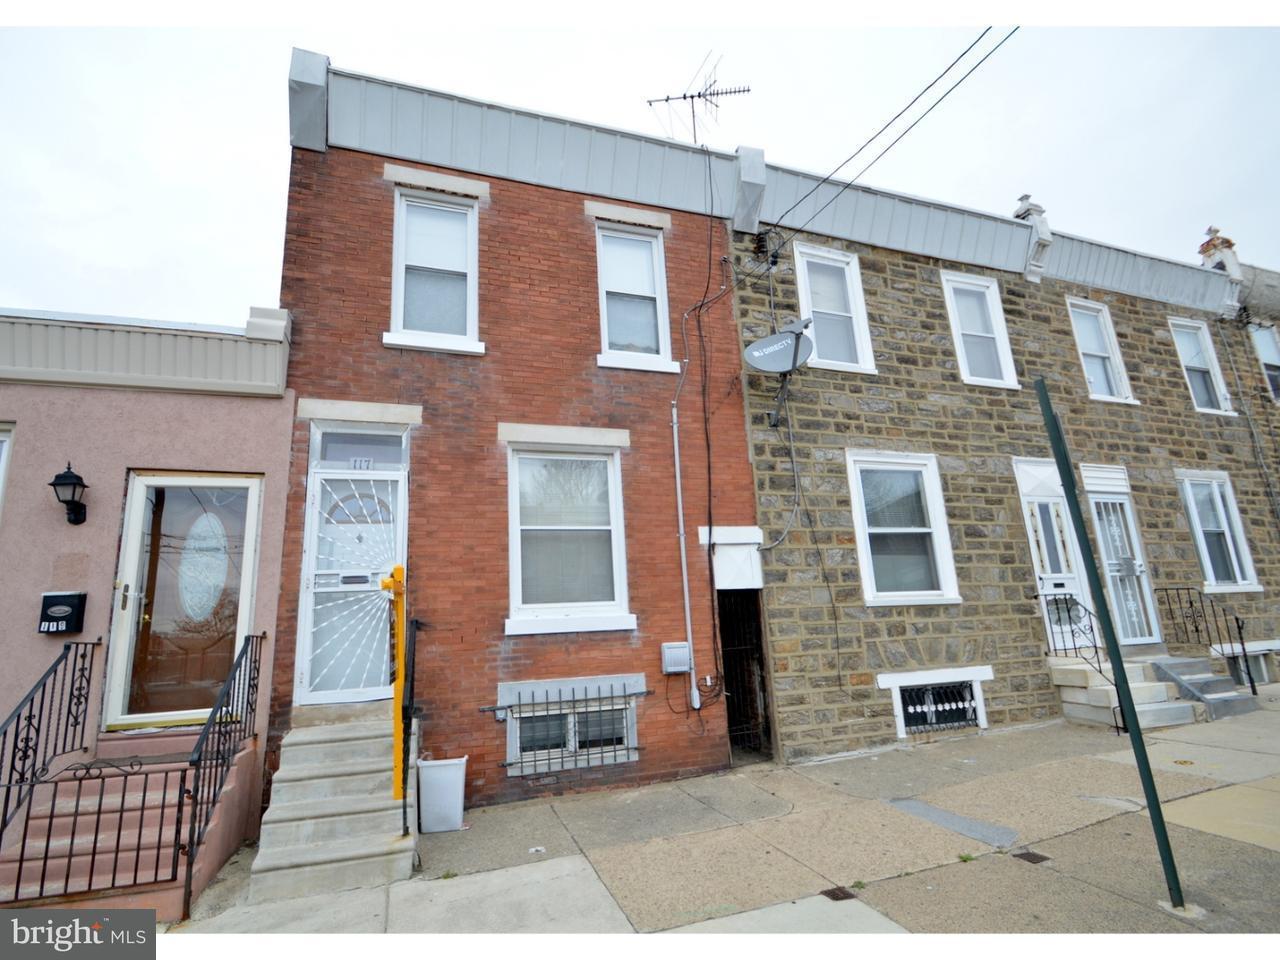 117 W Courtland Street Philadelphia, PA 19140